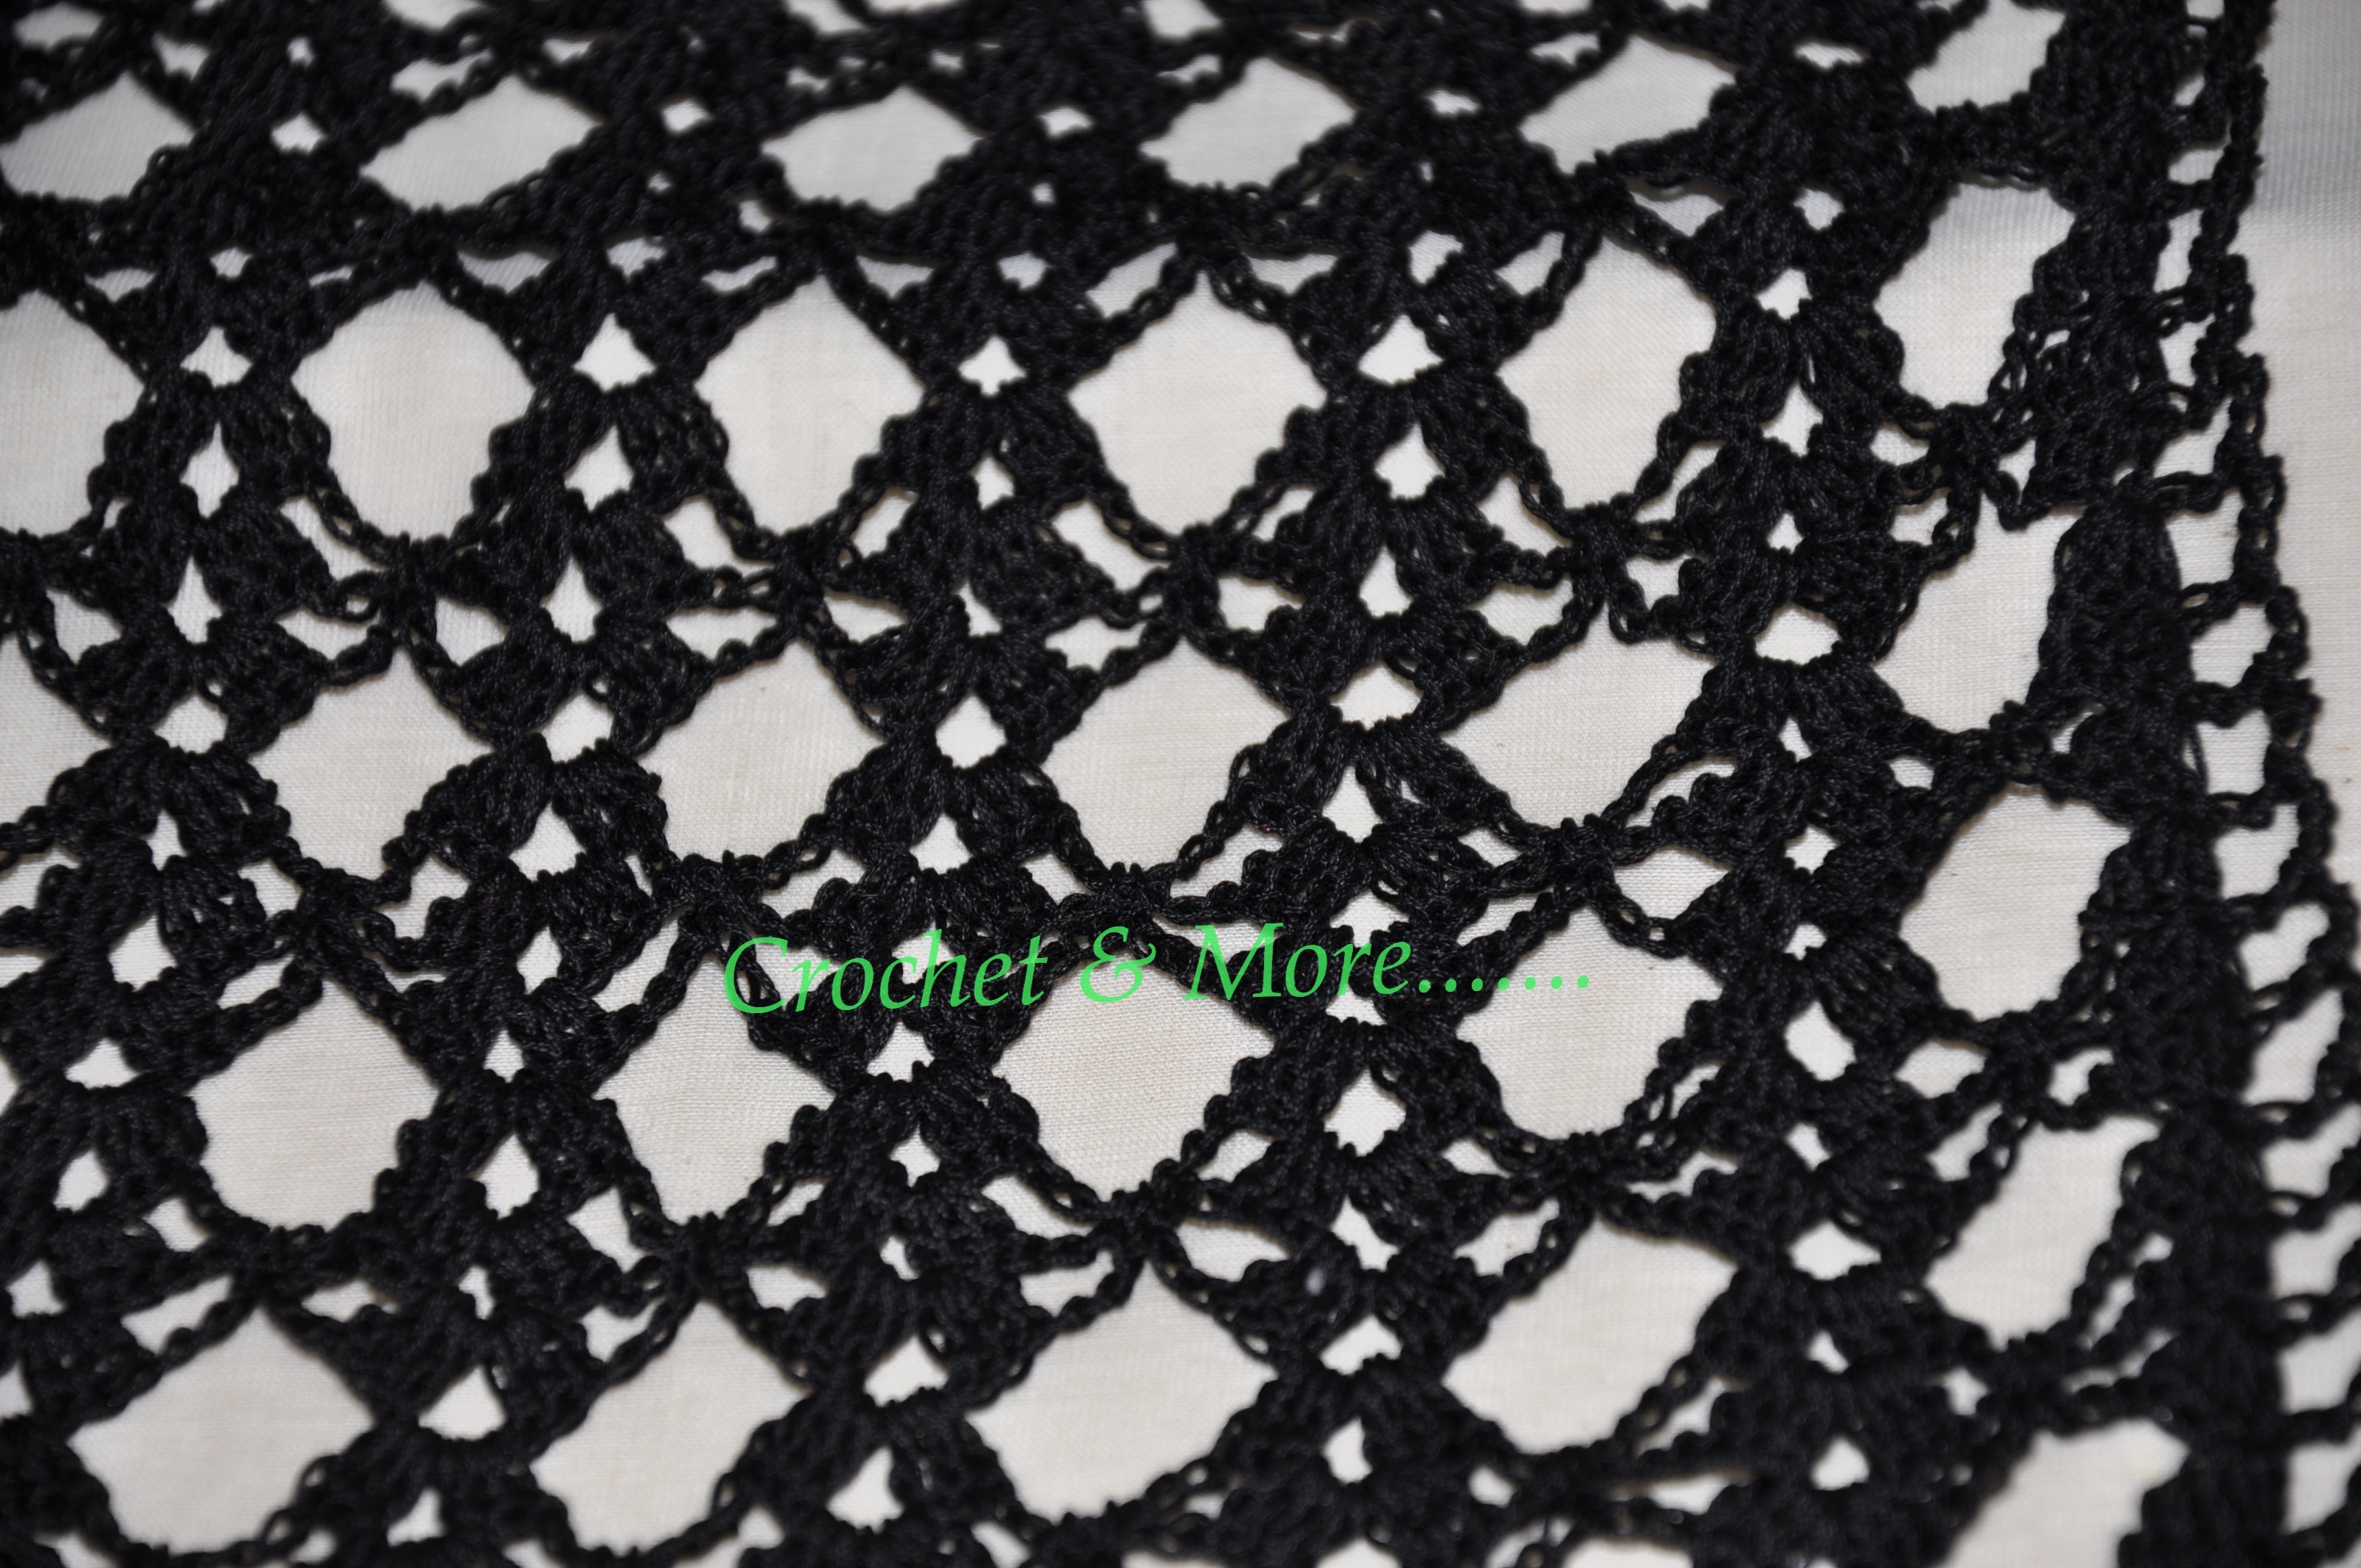 November 2014 Crochetnmore Crochet Flower Motif Motivos Hexagonales Pinterest Dsc 8815